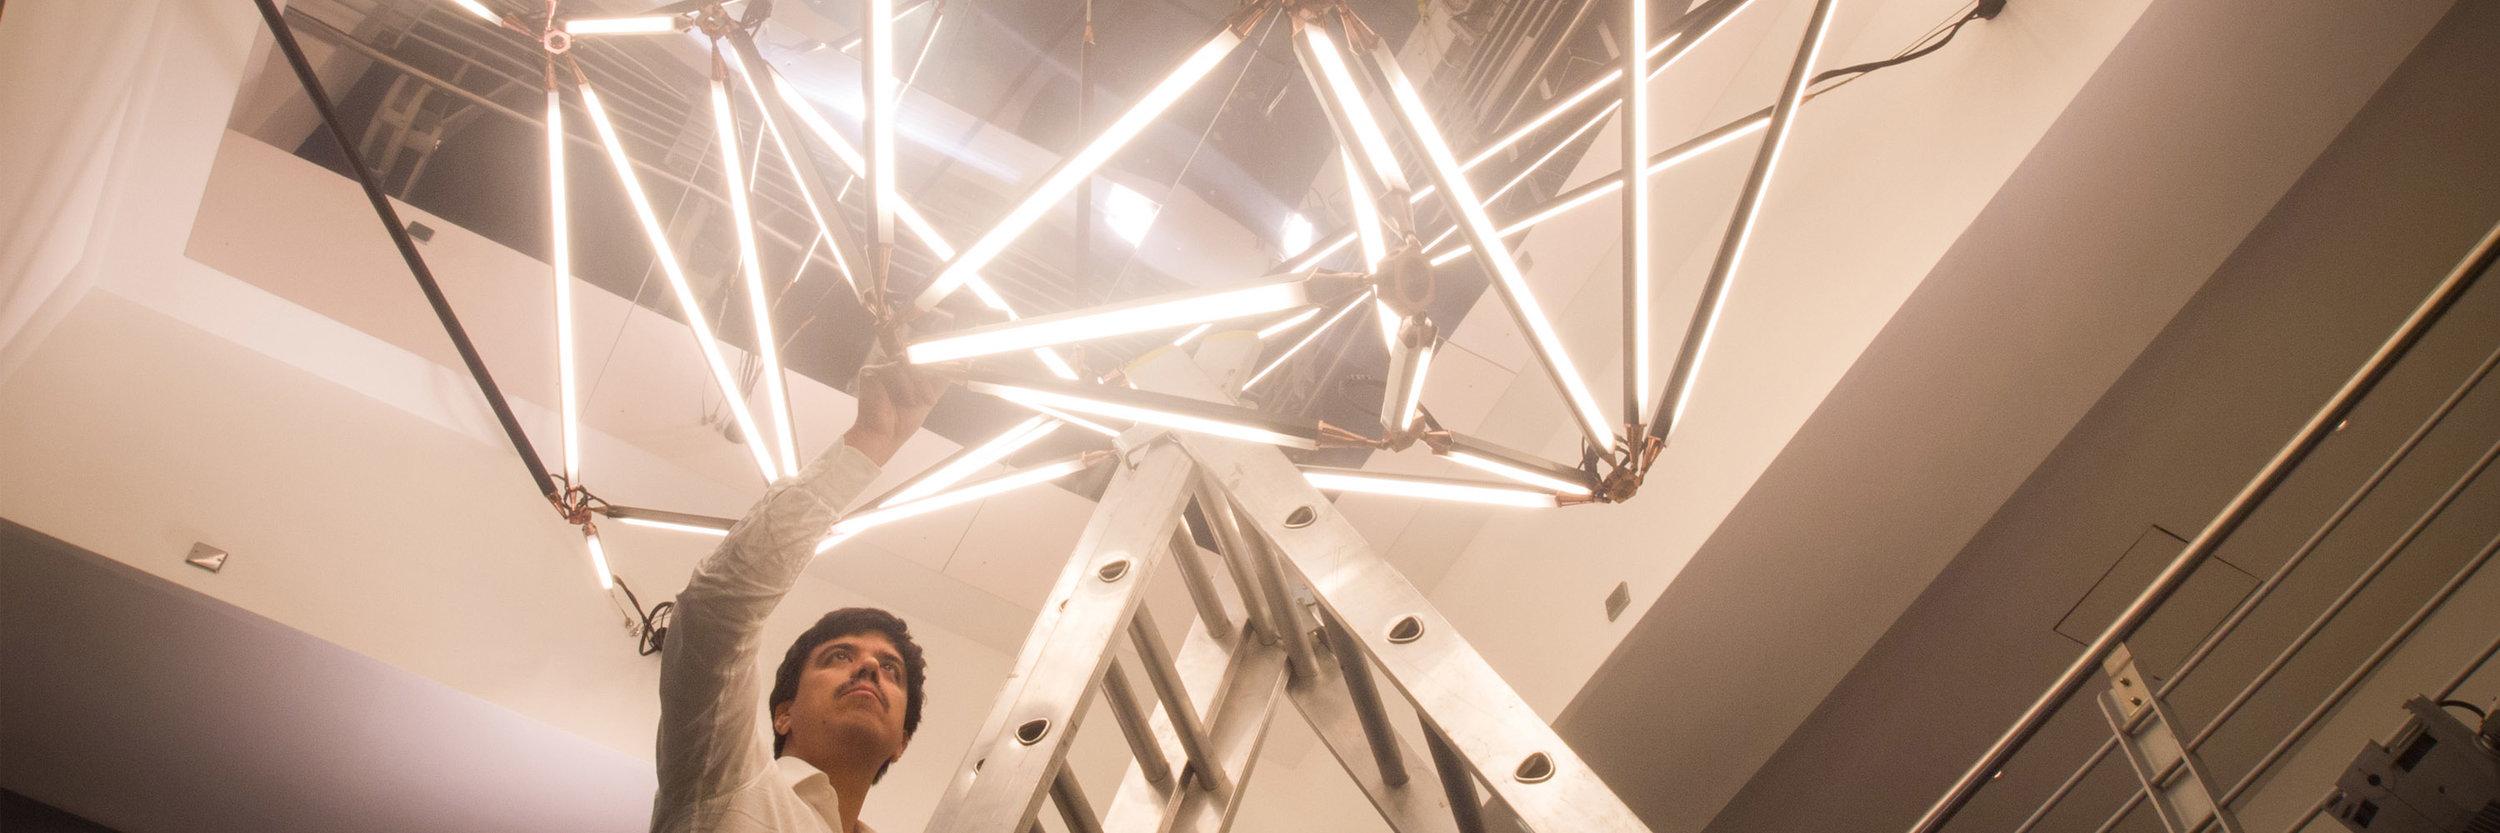 Jones-and-Partners-Kinetica-lighting-install.jpg